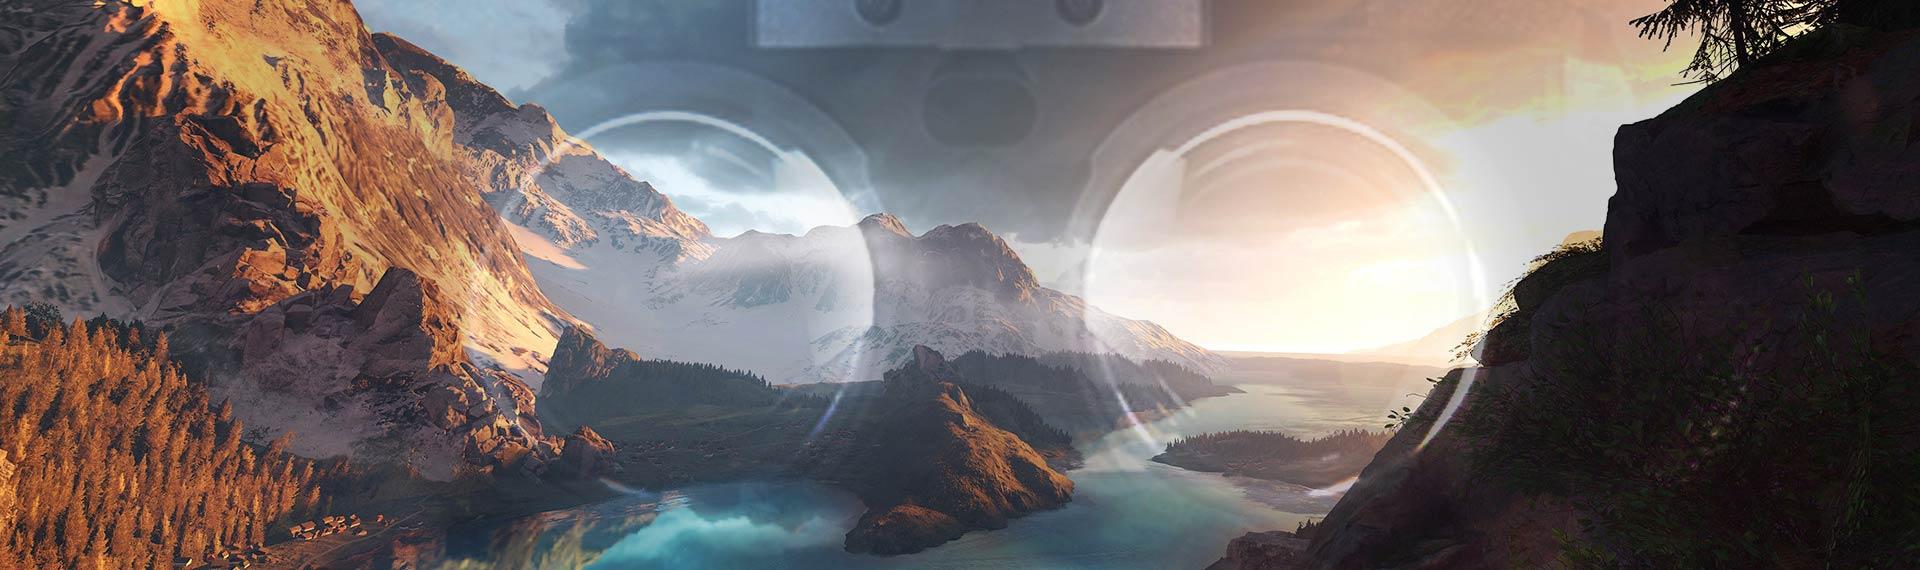 4 Keuntungan Tak Terduga Kalau Kamu Bermain Game berbentuk Virtual Reality!